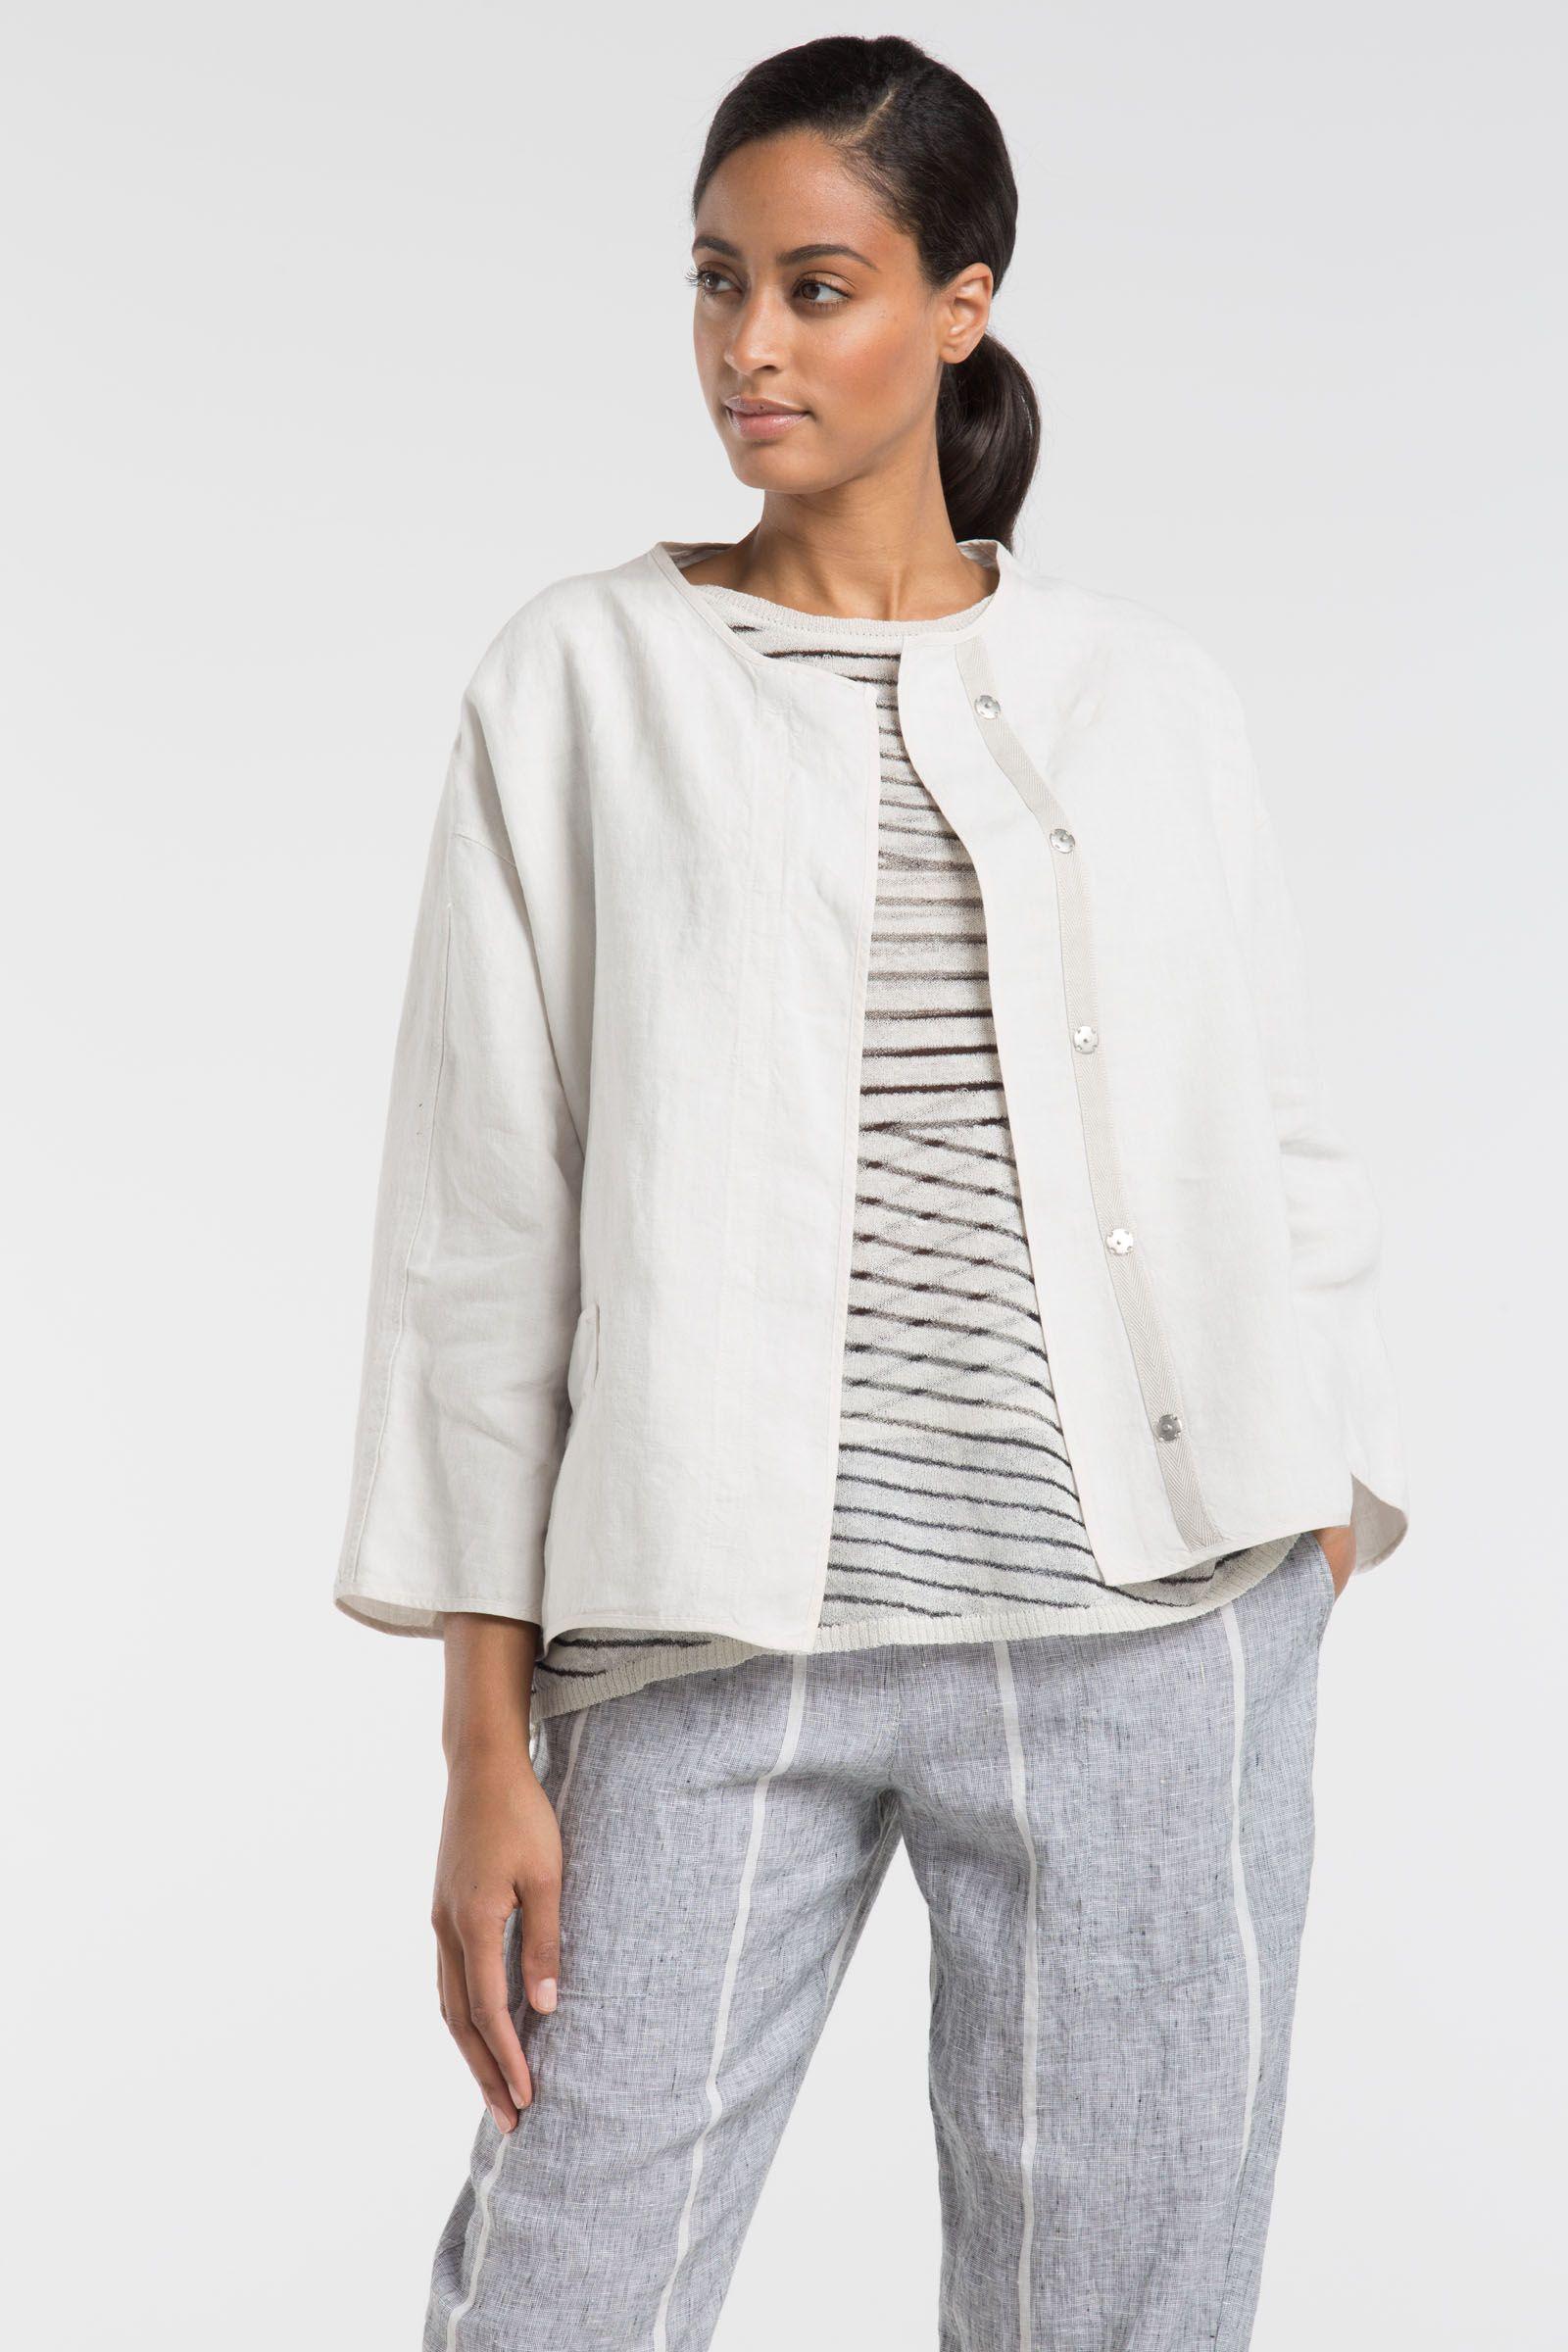 OSKA New York offers elegant evening Jacket Talida.